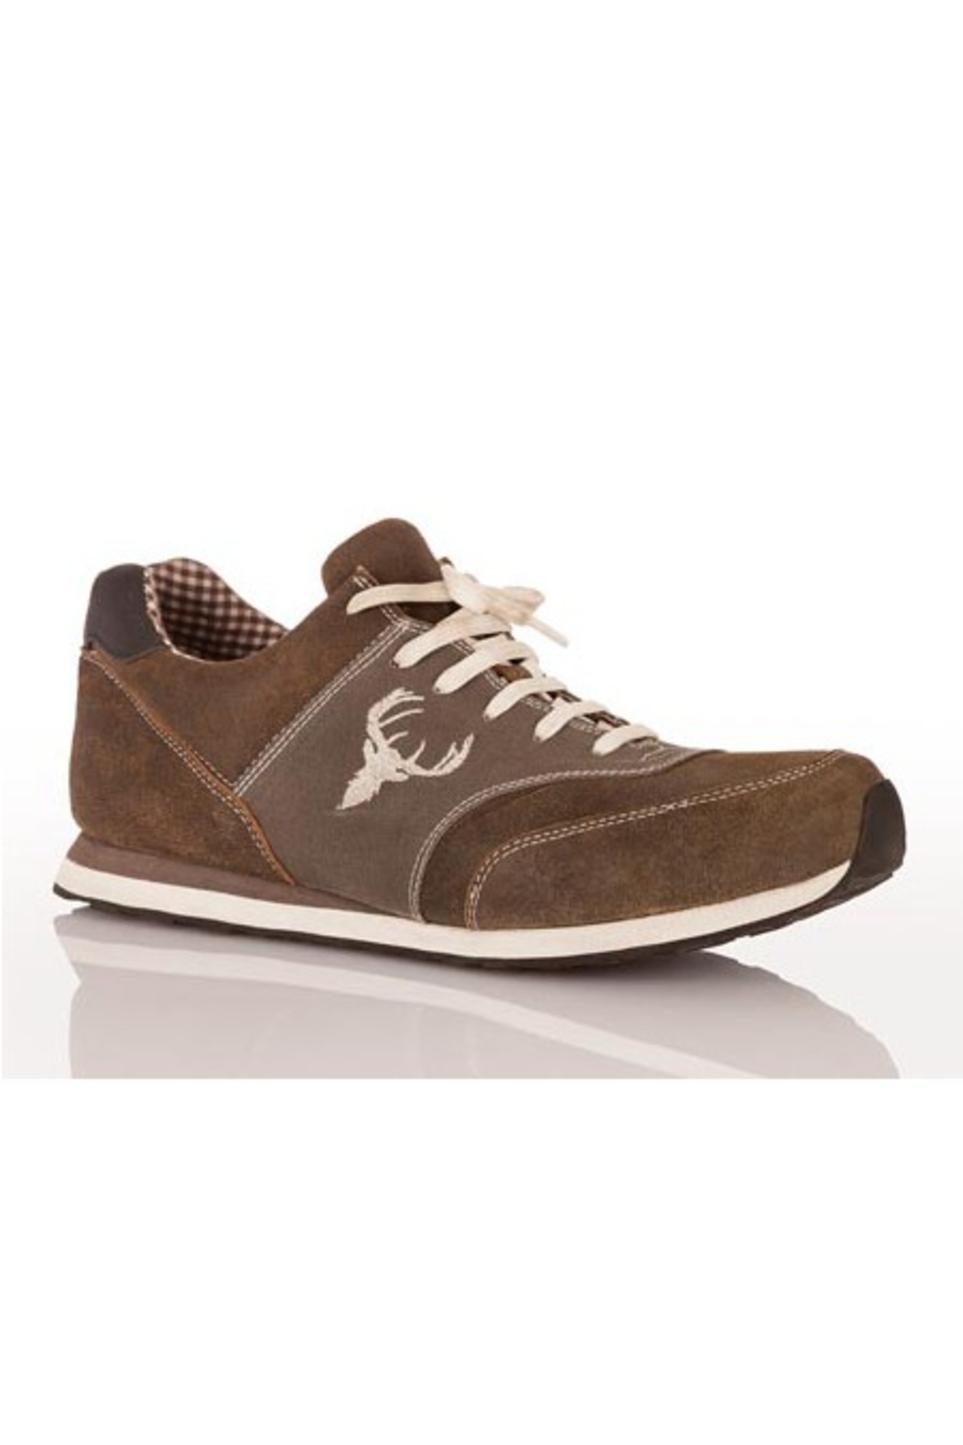 MADDOX HERREN TRACHTEN Schuhe Sneaker Siegfried Braun Leder Oktoberfest Gr 40 50